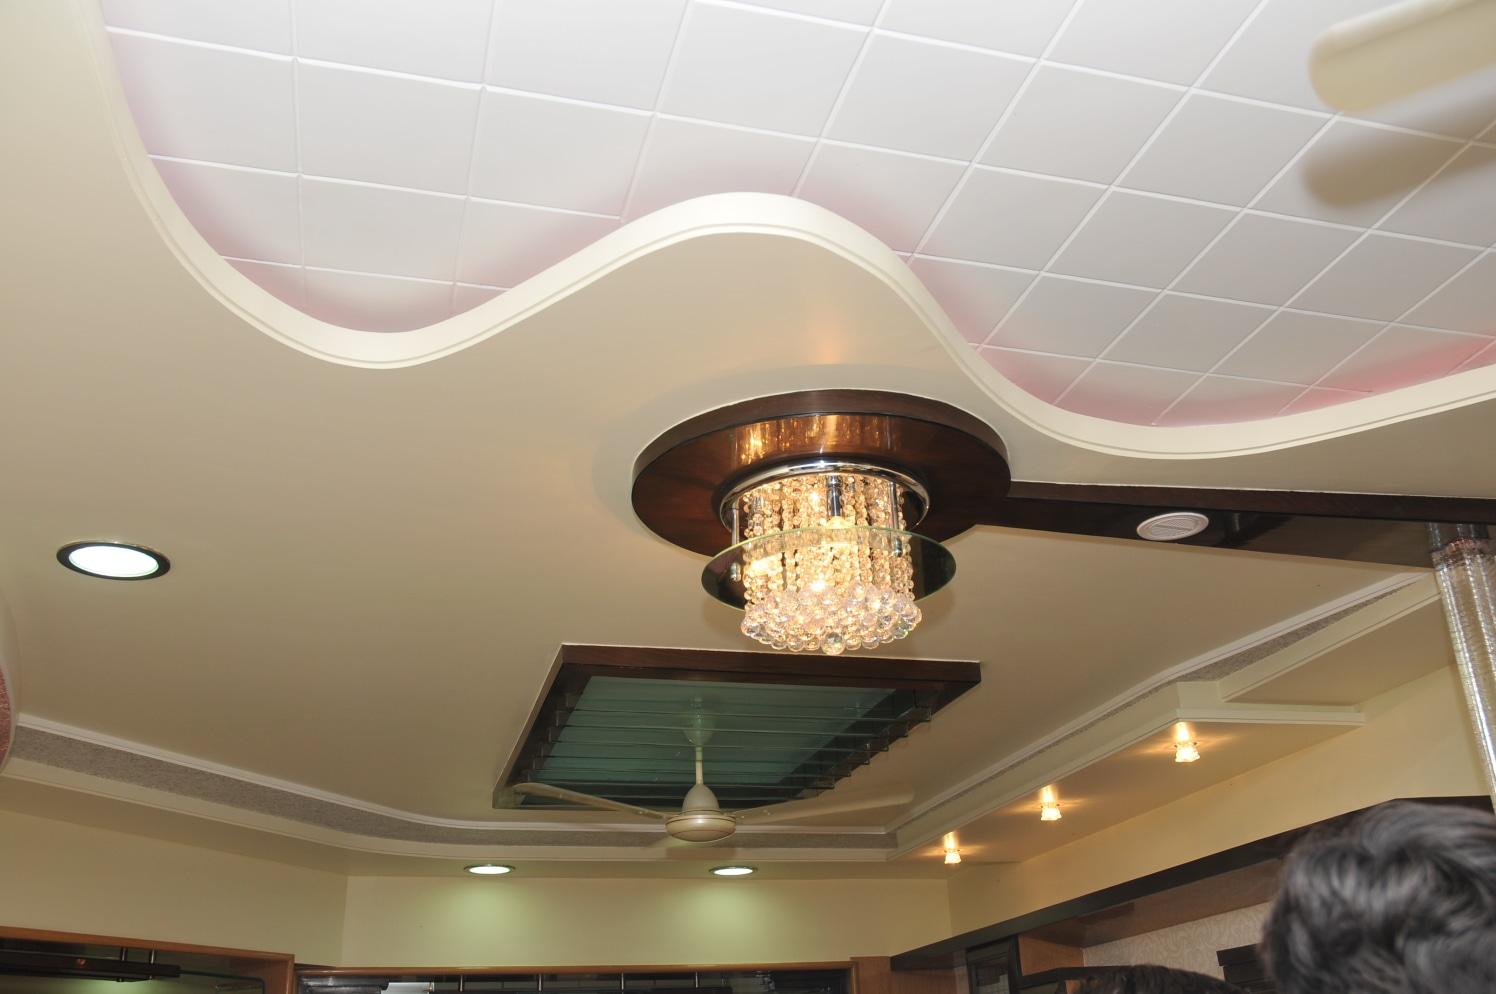 Contemporary Ceiling by Bhavin Shah Traditional Modern Contemporary | Interior Design Photos & Ideas